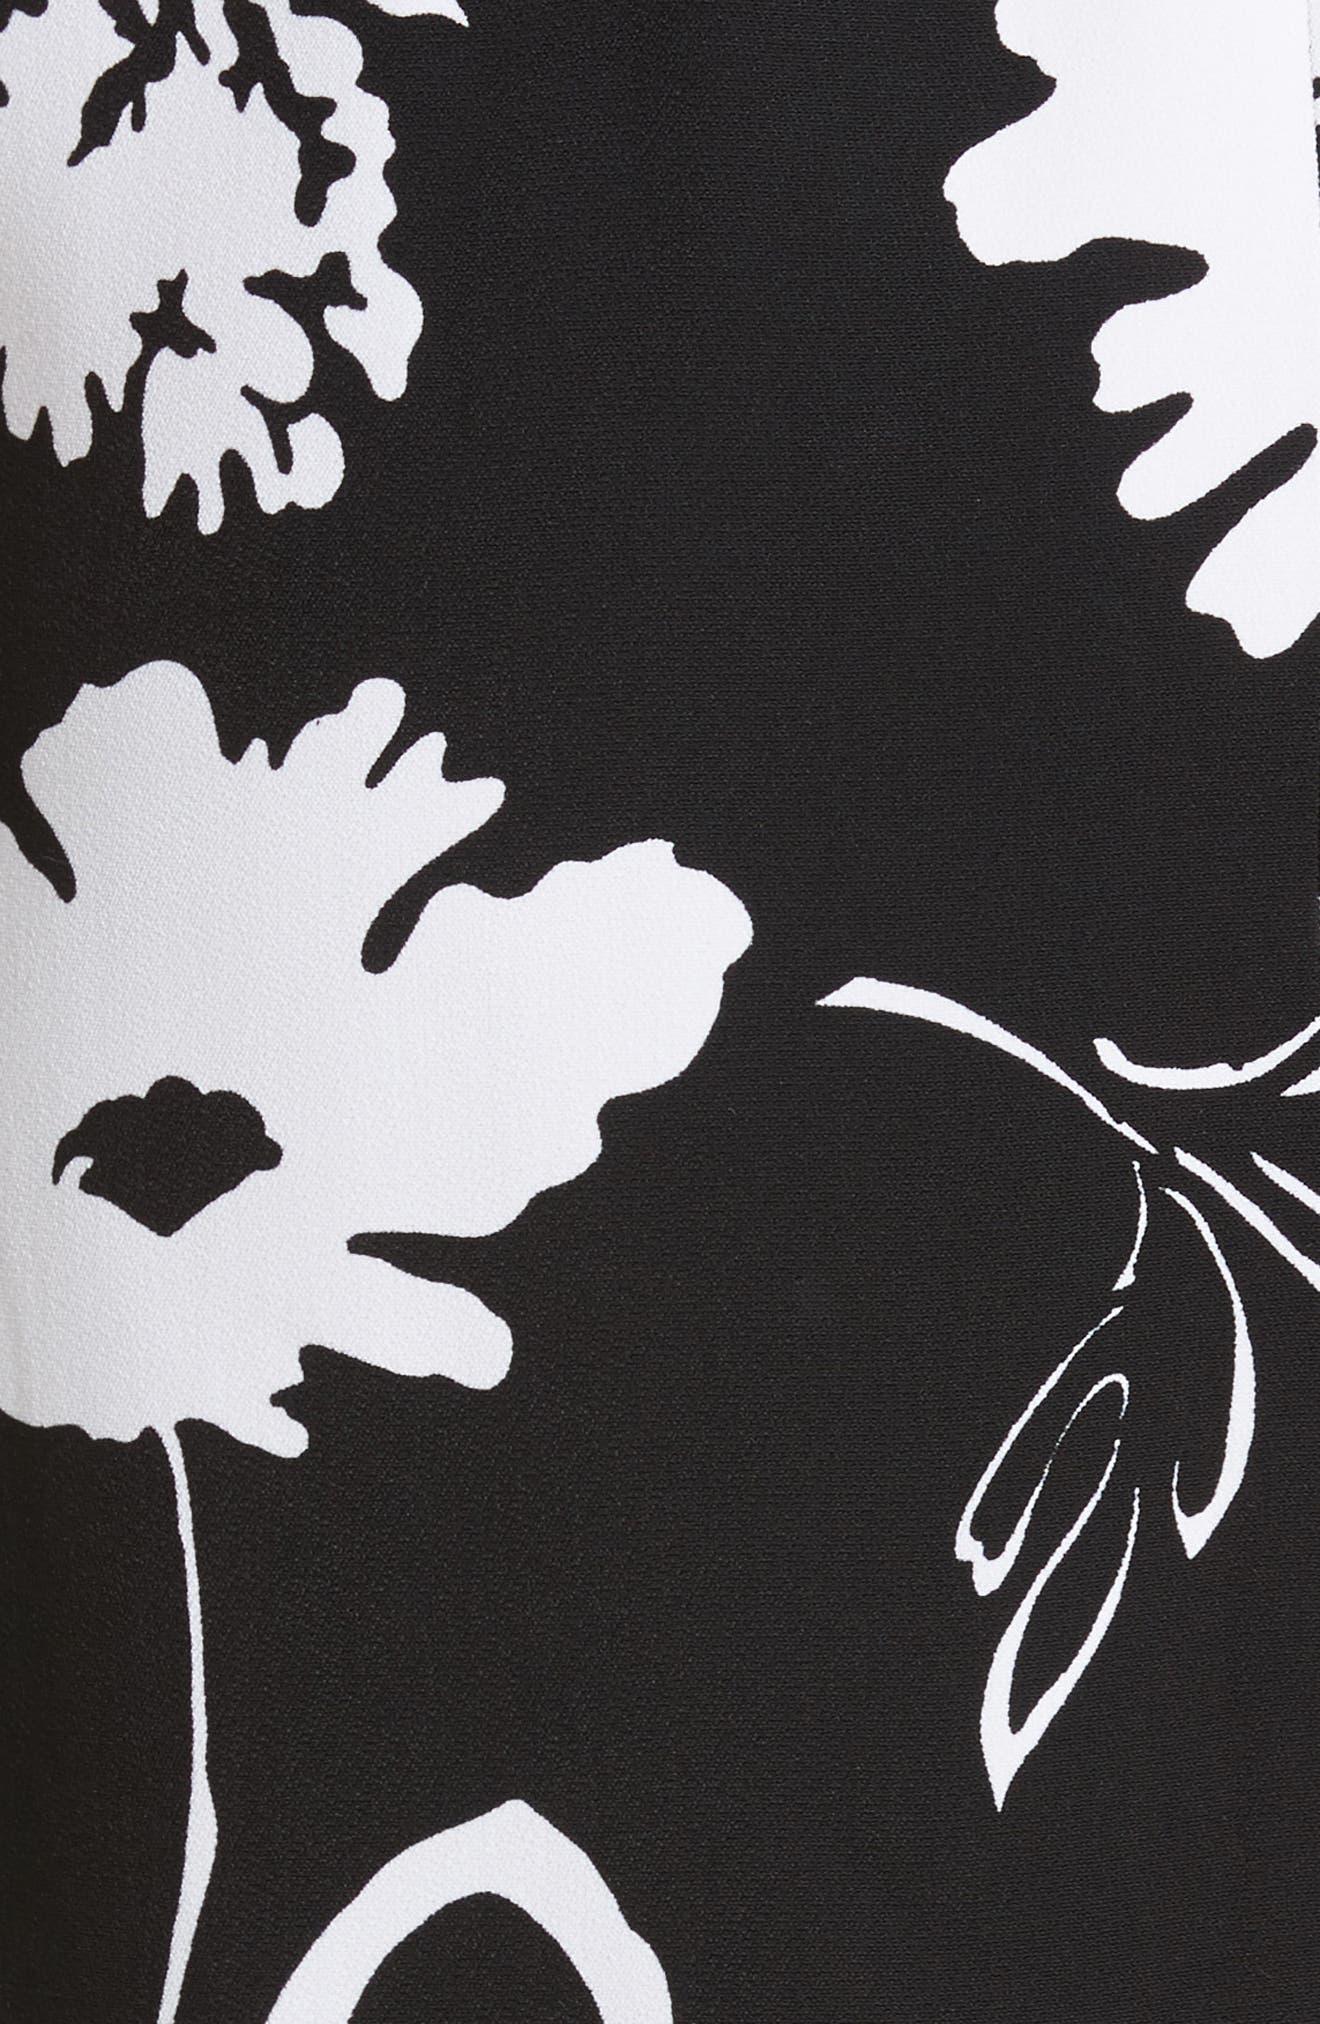 Floral Print Pencil Skirt,                             Alternate thumbnail 5, color,                             Black / White